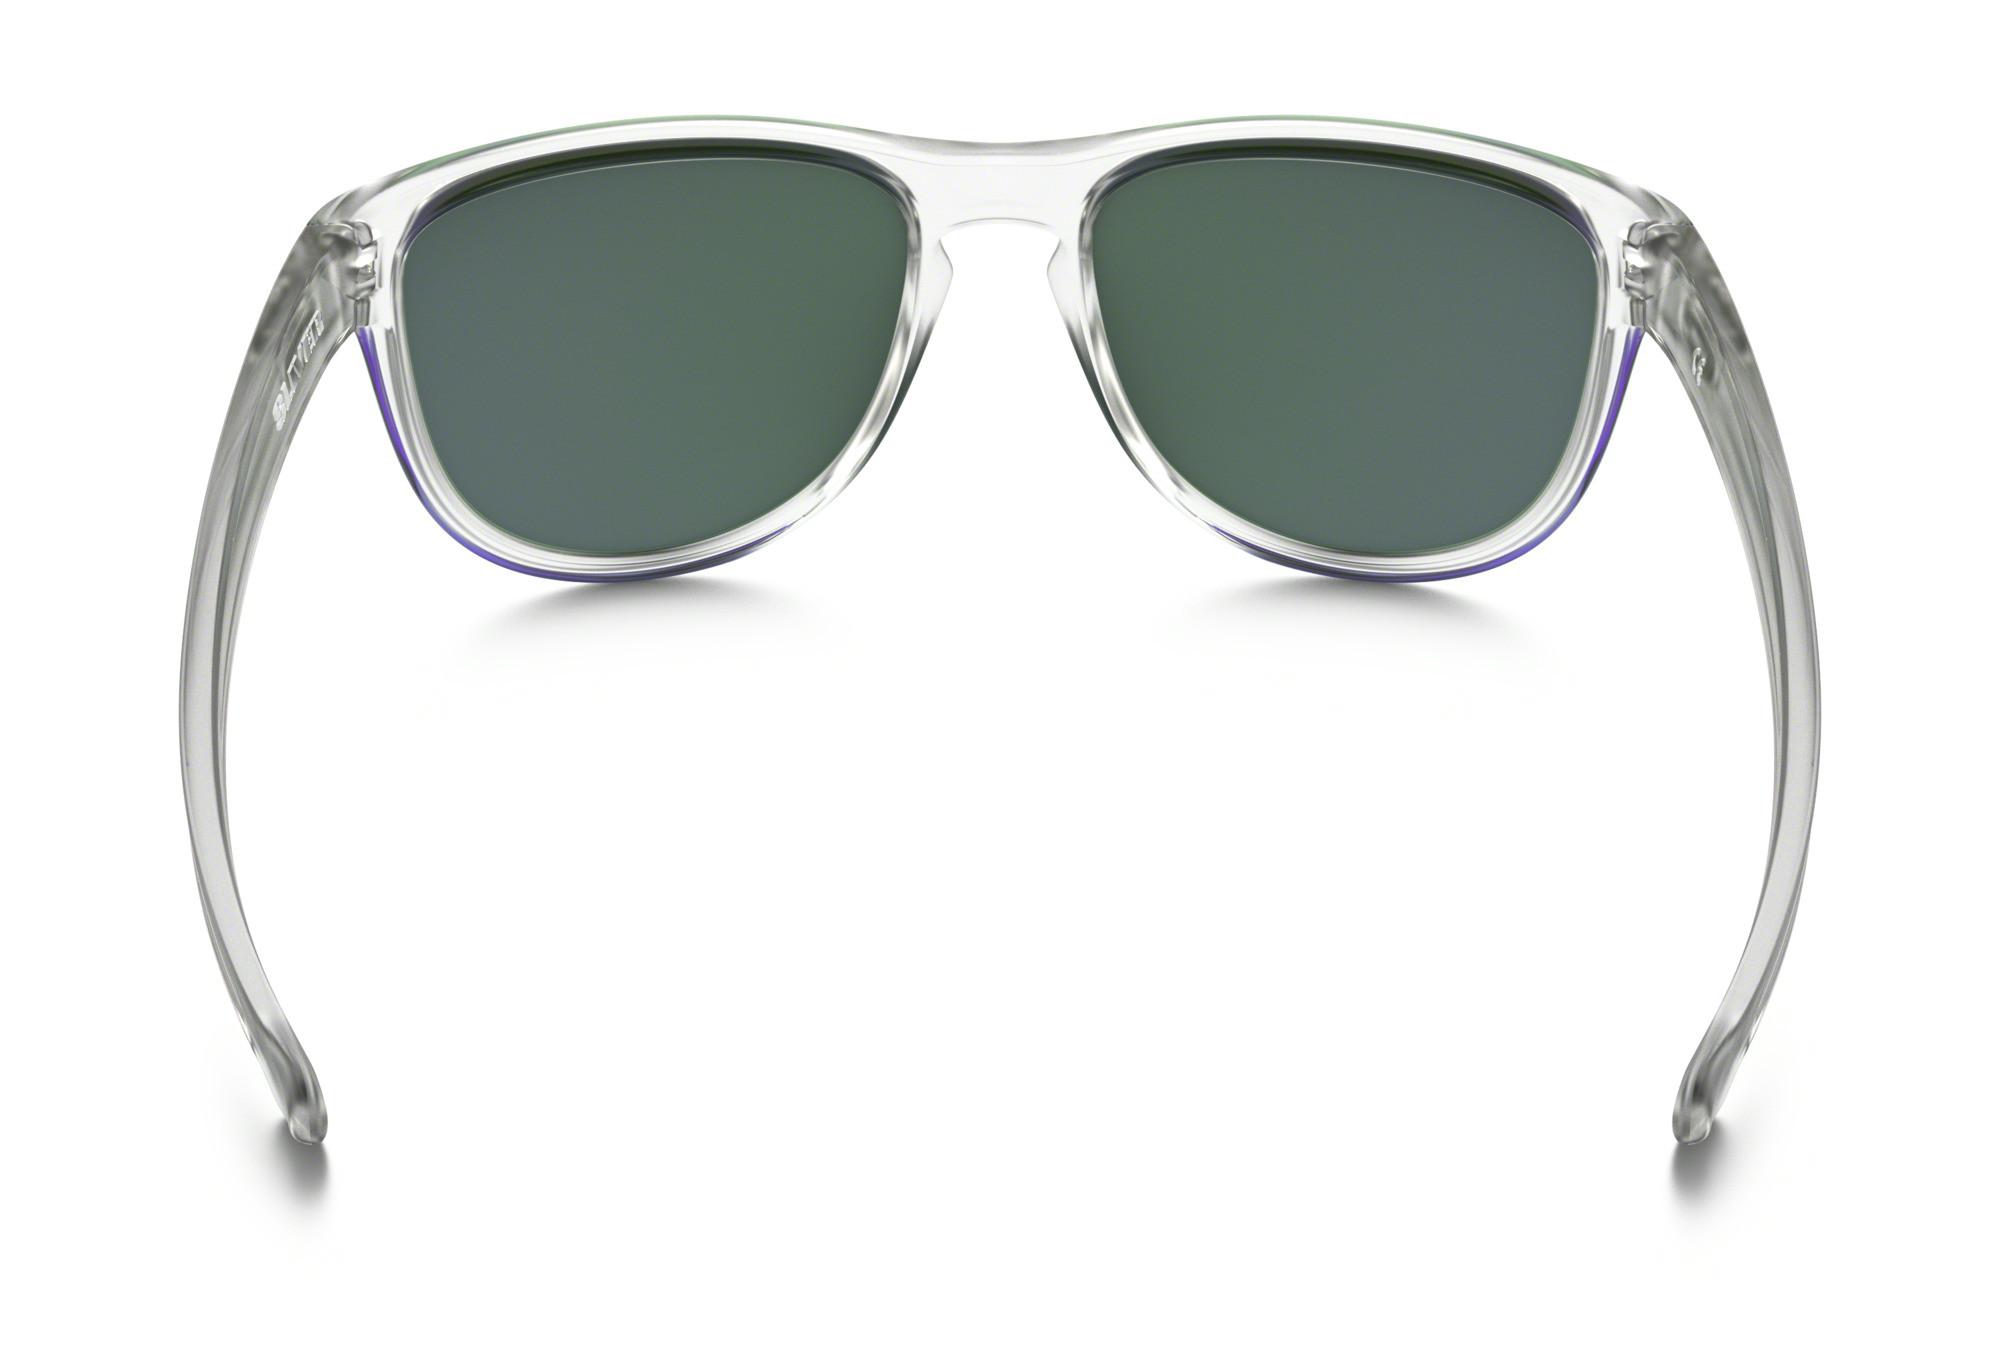 Clearviolet Sliver R Iridium Oakley Sunglasses 02 RefOo9342 Matte tdoshQrCxB